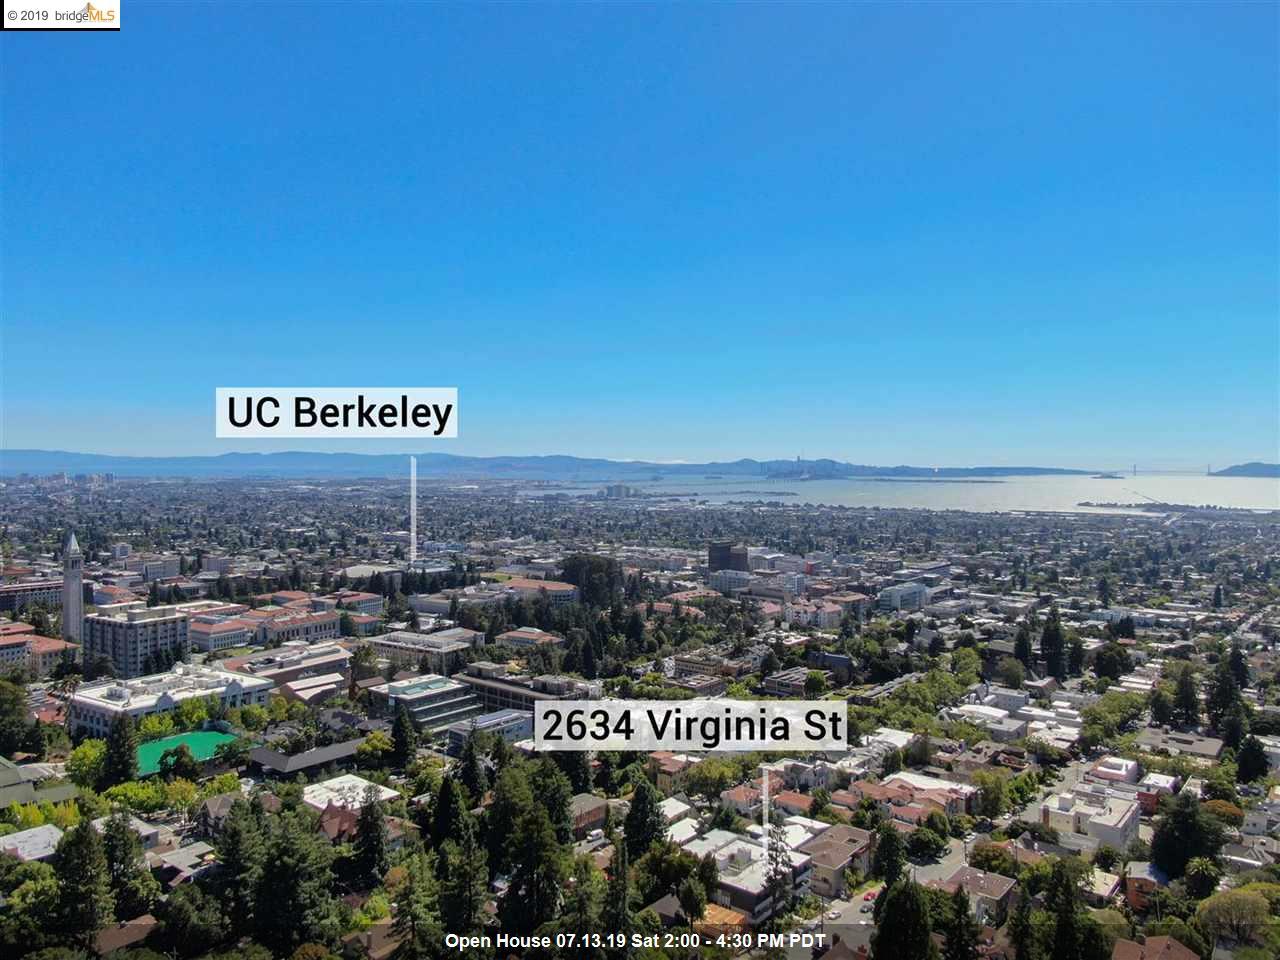 2634 Virginia St #14 Berkeley, CA 94709